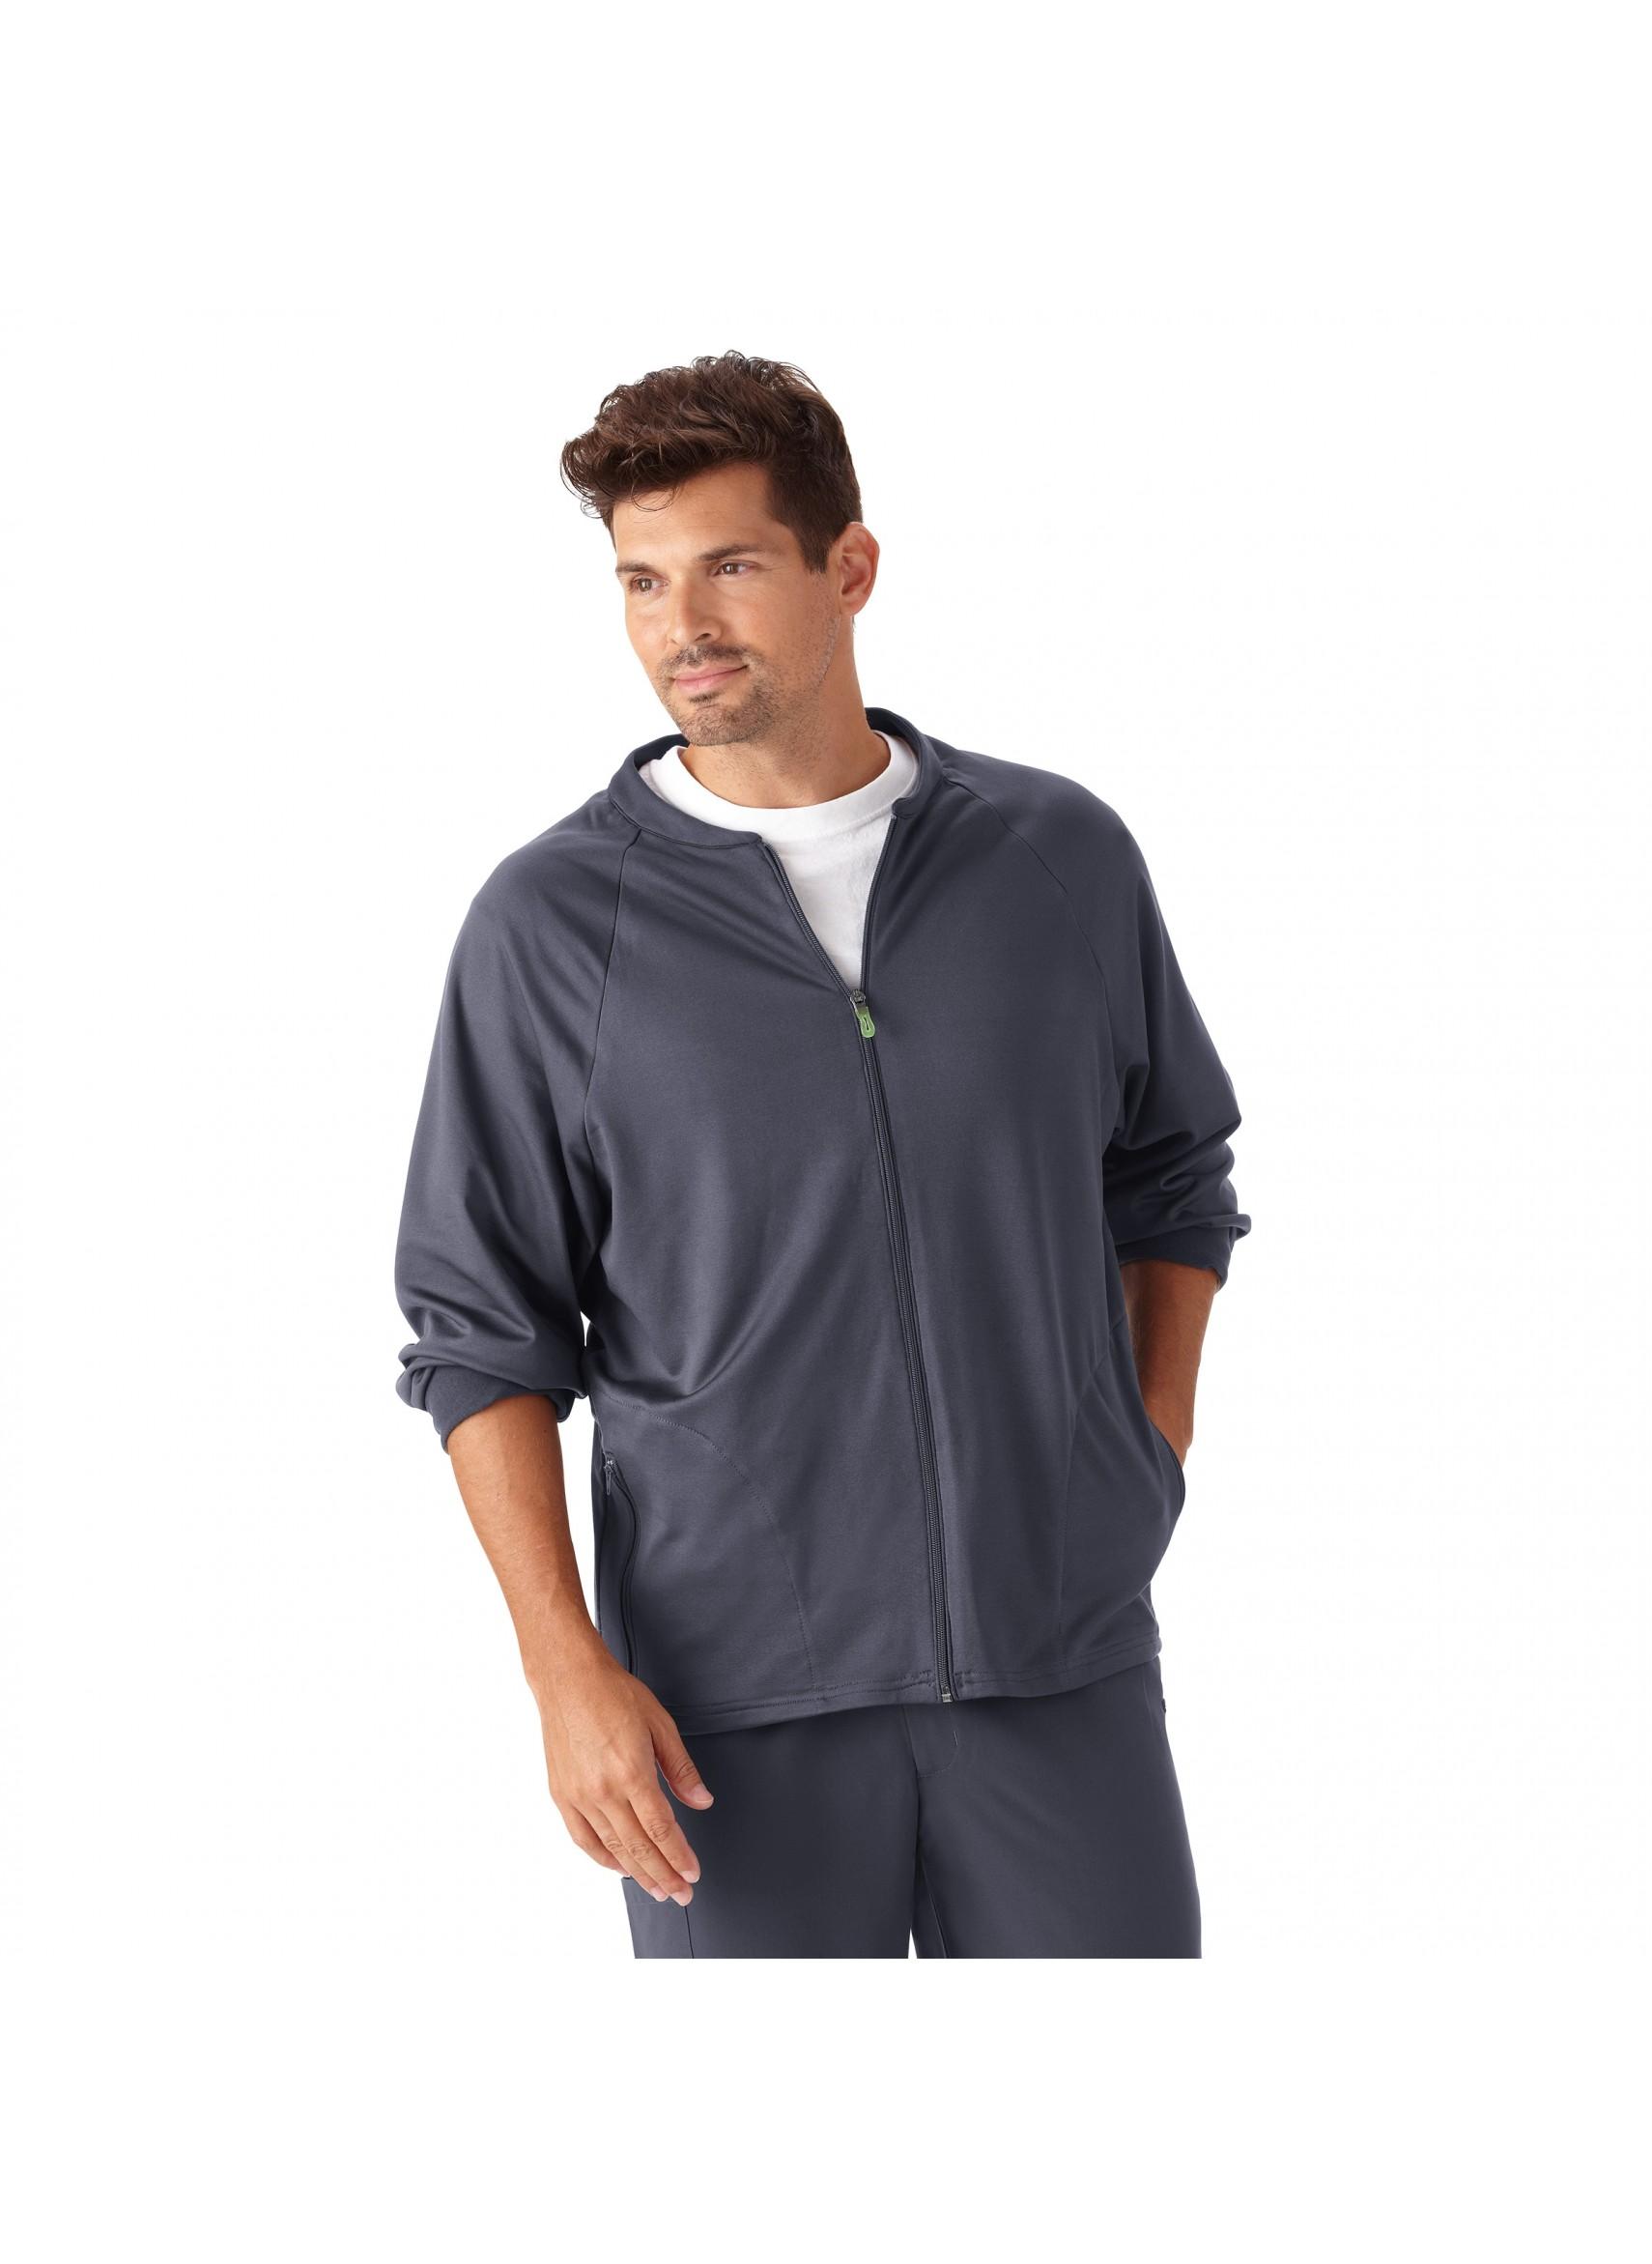 Jockey Mens Front Zip Fleece Lined Warm Up Scrub Jacket 2397